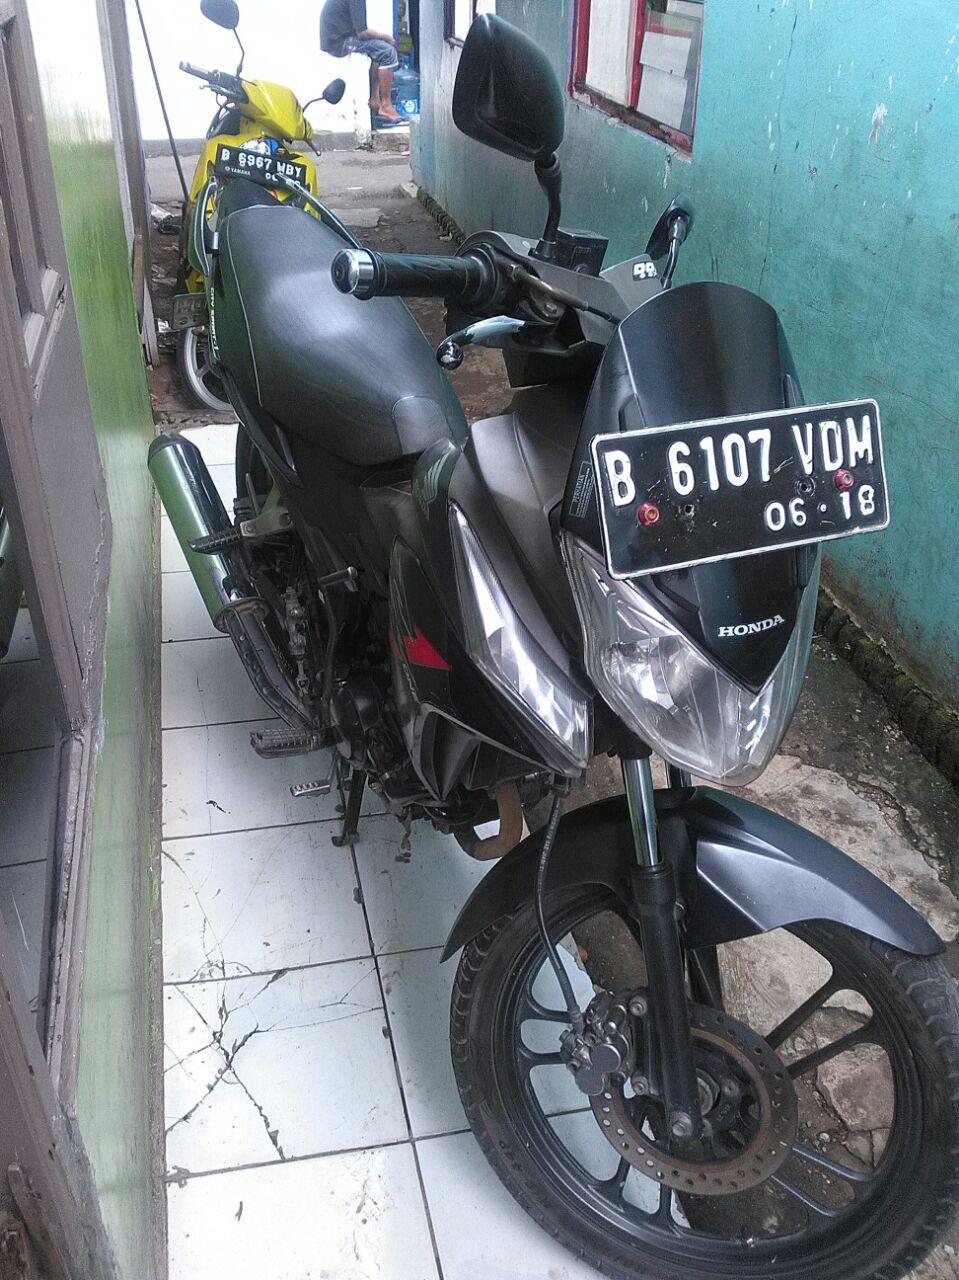 Jual Beli Motor Bekas Yamaha Fino 125 Grande Otr Jabodetabek Banten Biru Cod Sekitaran Buaran Plaza Jakarta Timur